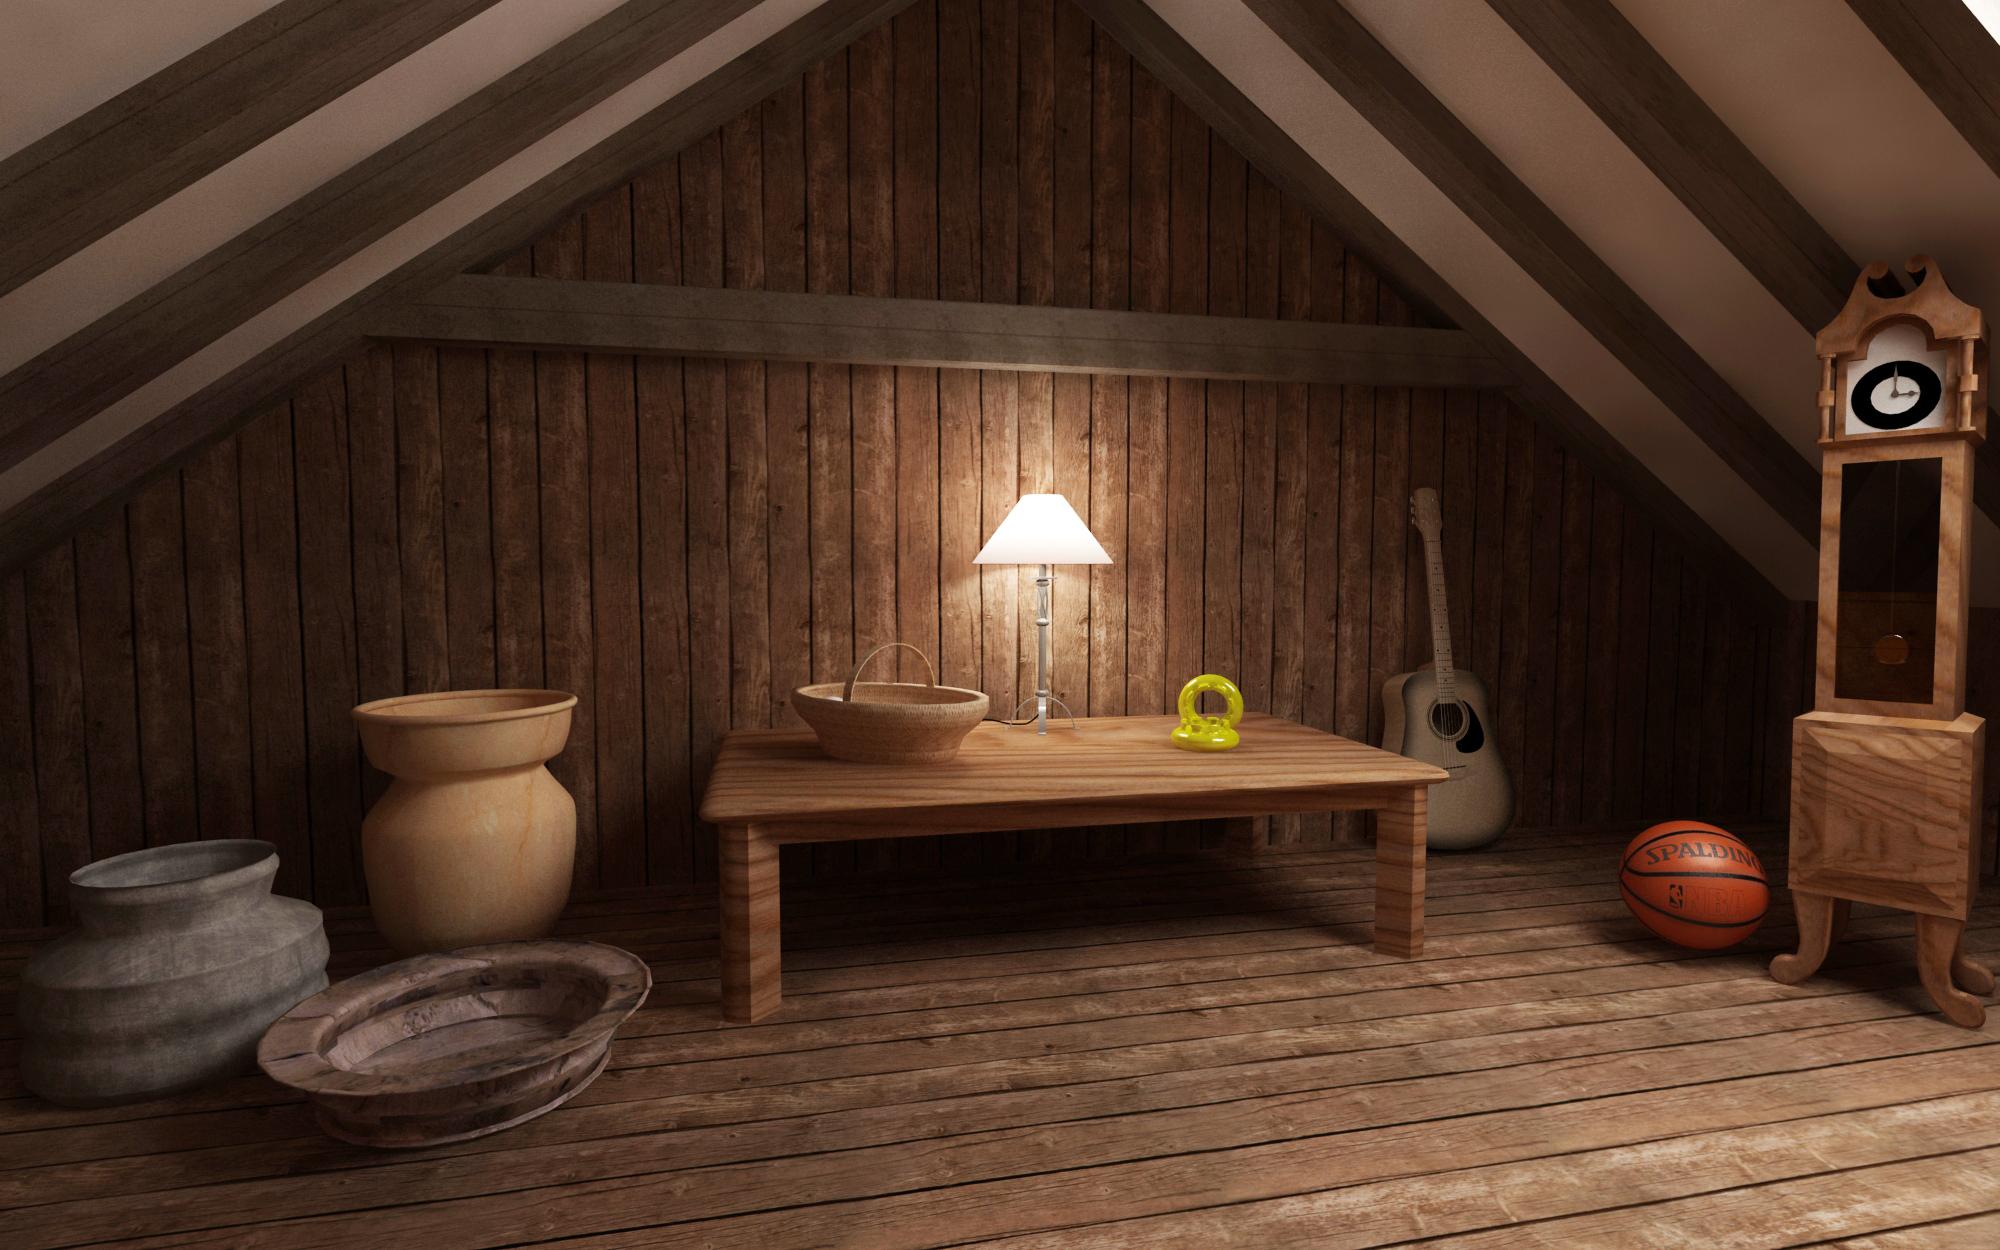 tiny attic ideas - BBC Cartoon Background Pitch by Daniel Kington at Coroflot